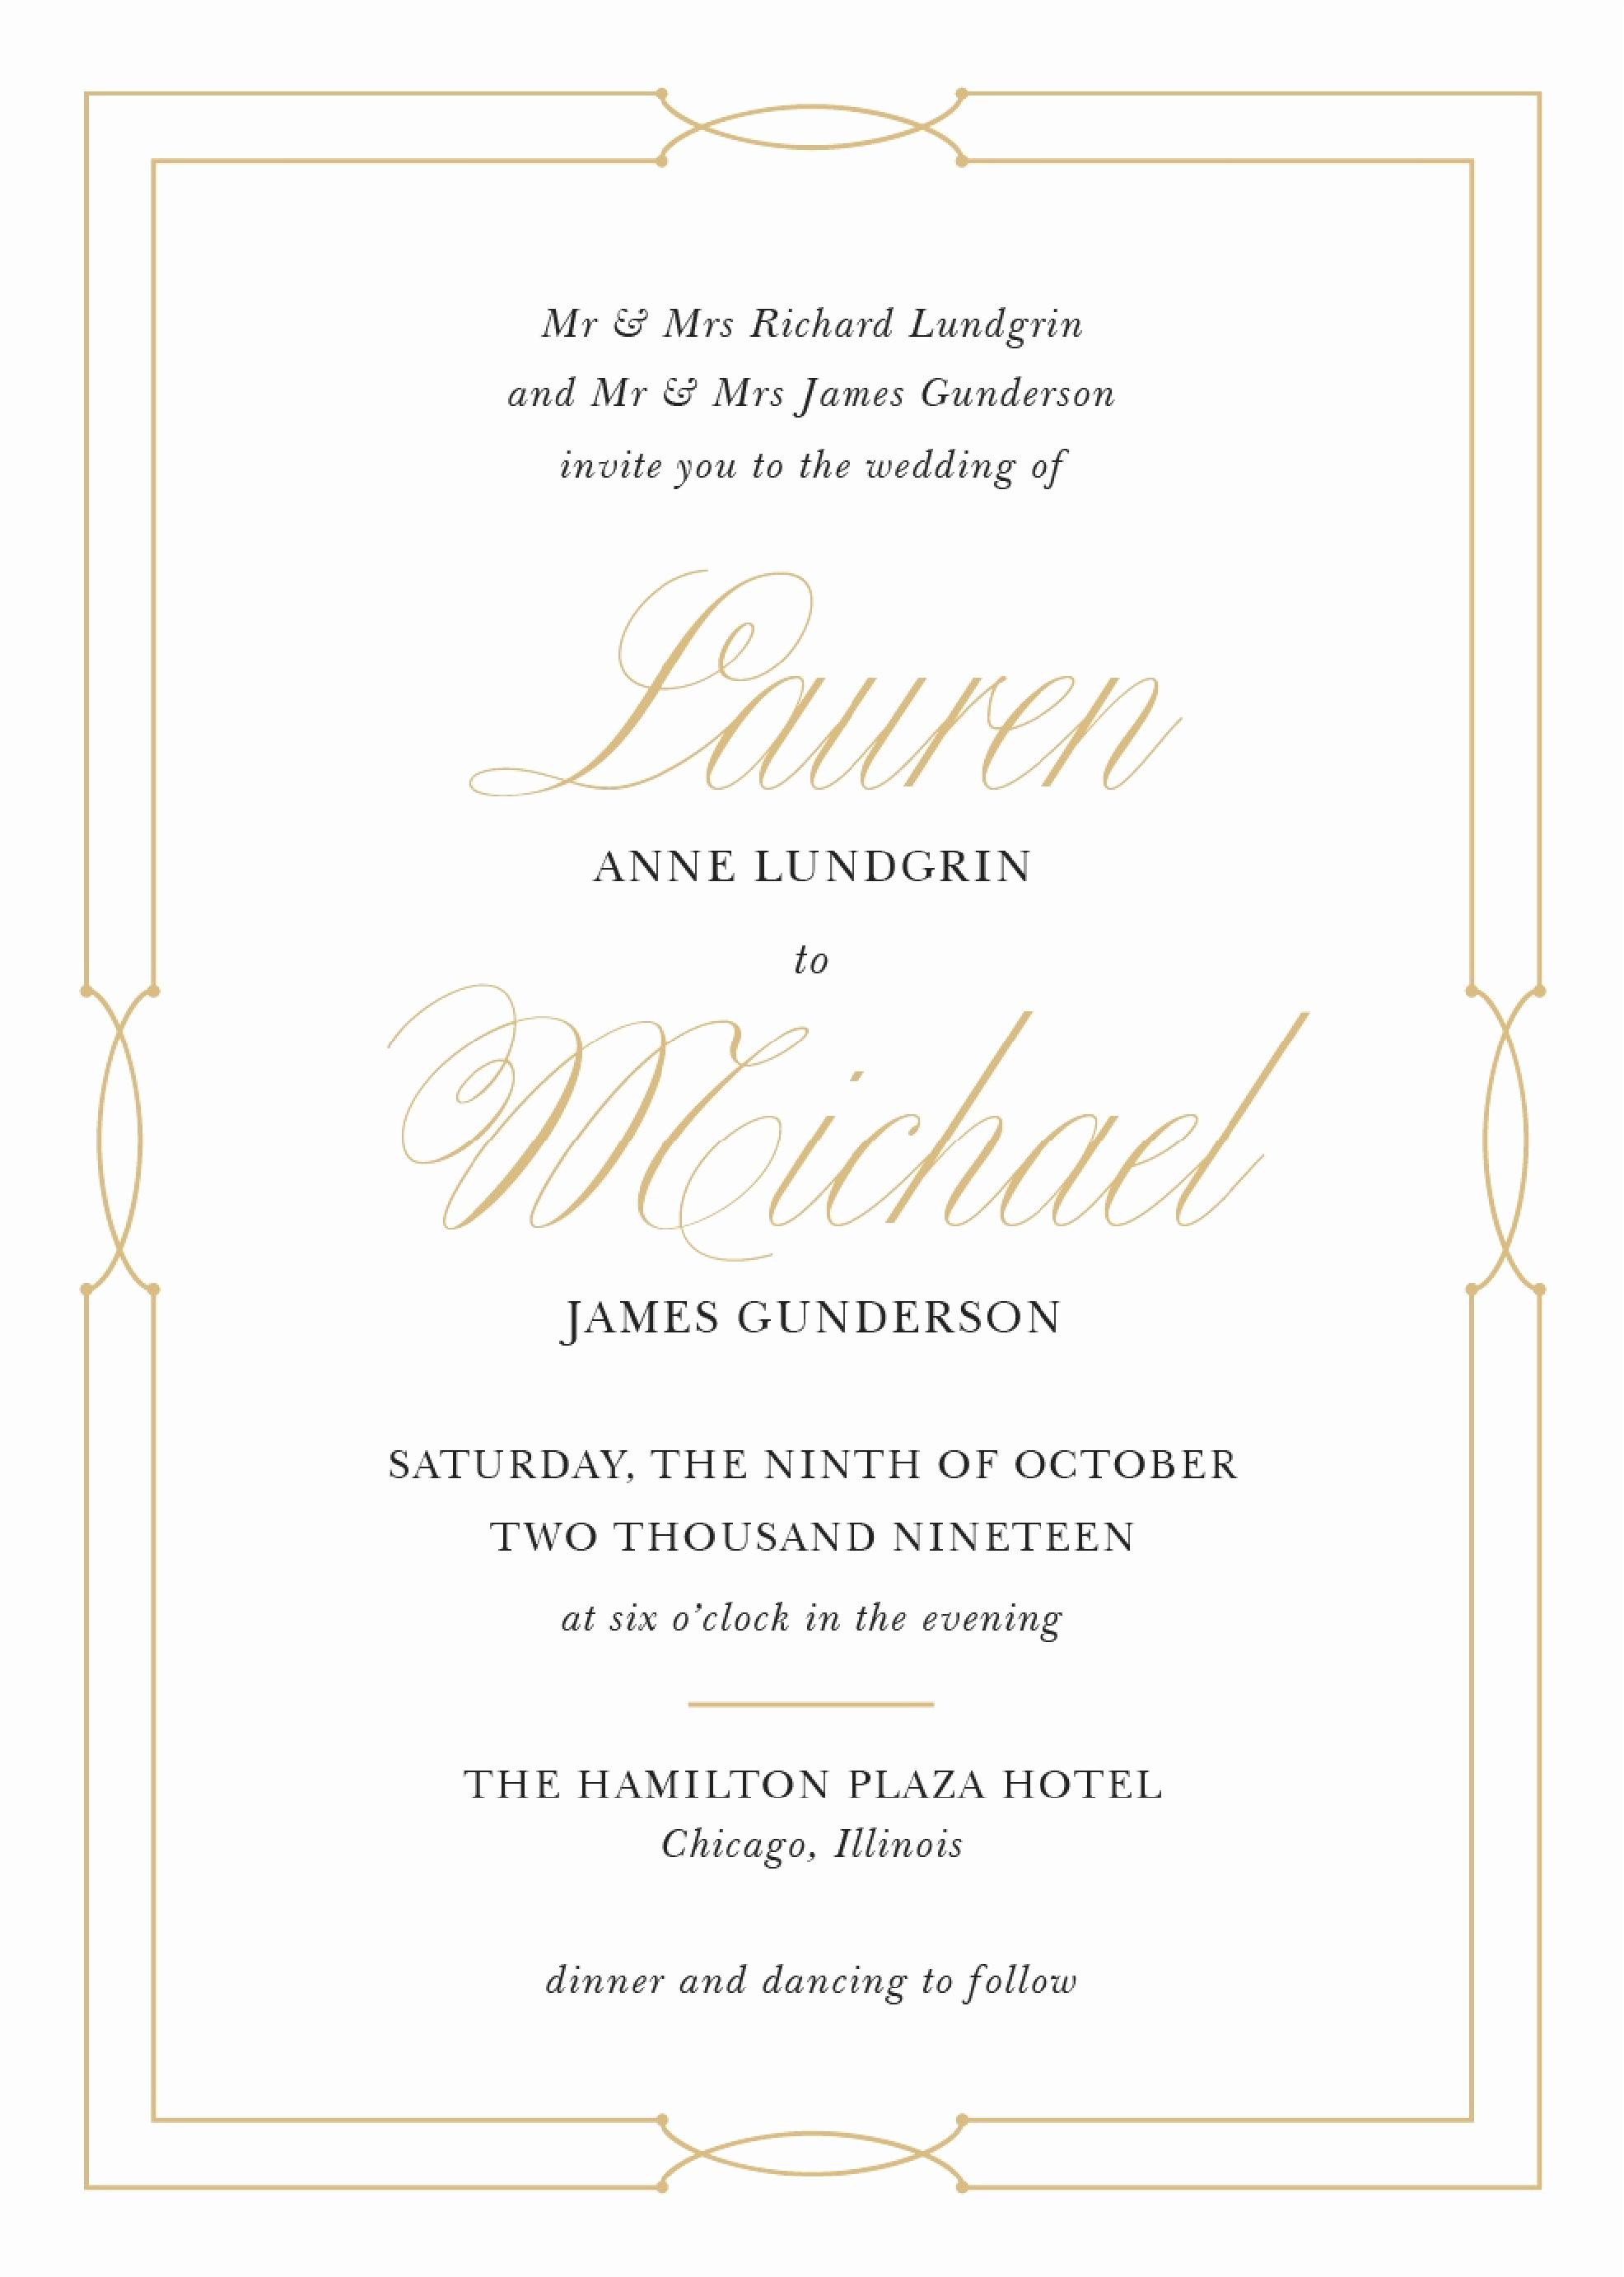 Second Wedding Invitation Wording Best Of Wedding Invitation Wording Samples